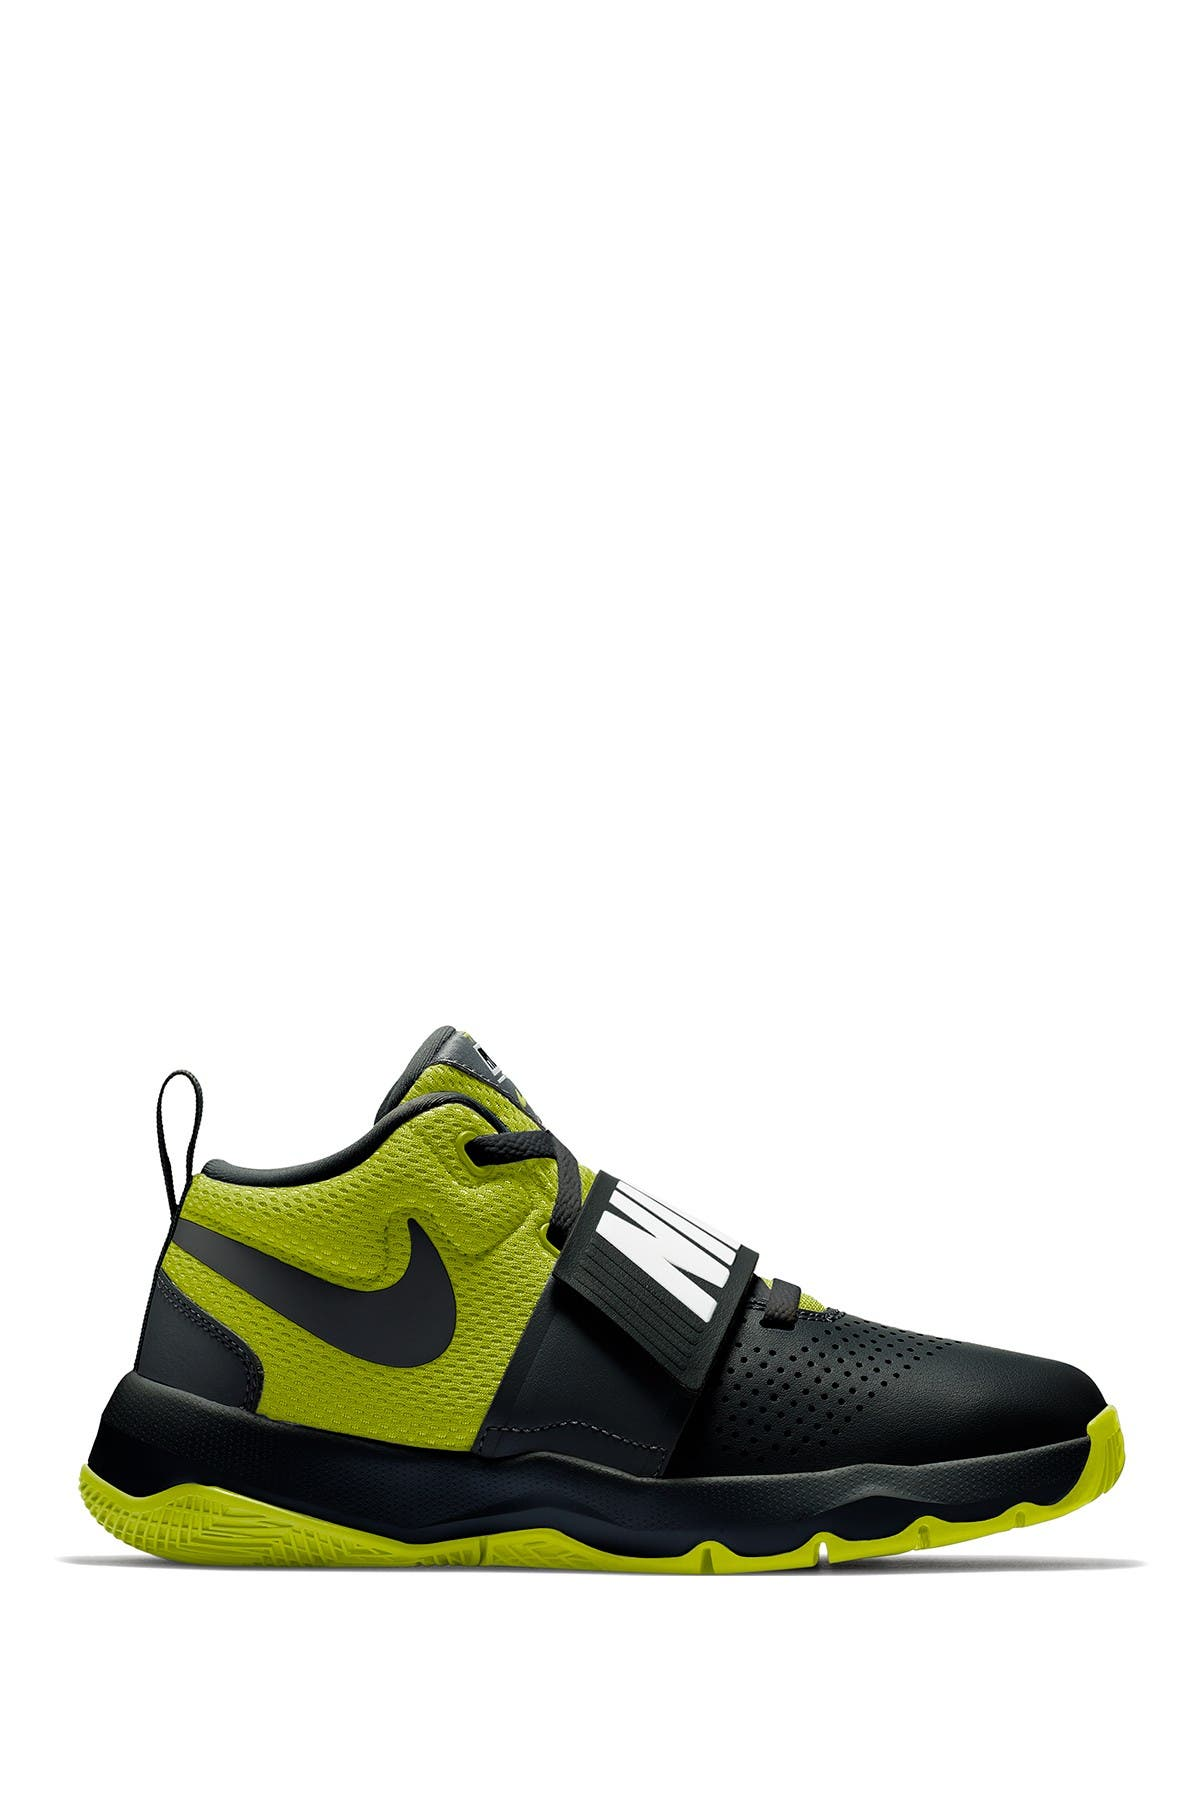 Image of Nike Team Hustle D8 Sneaker